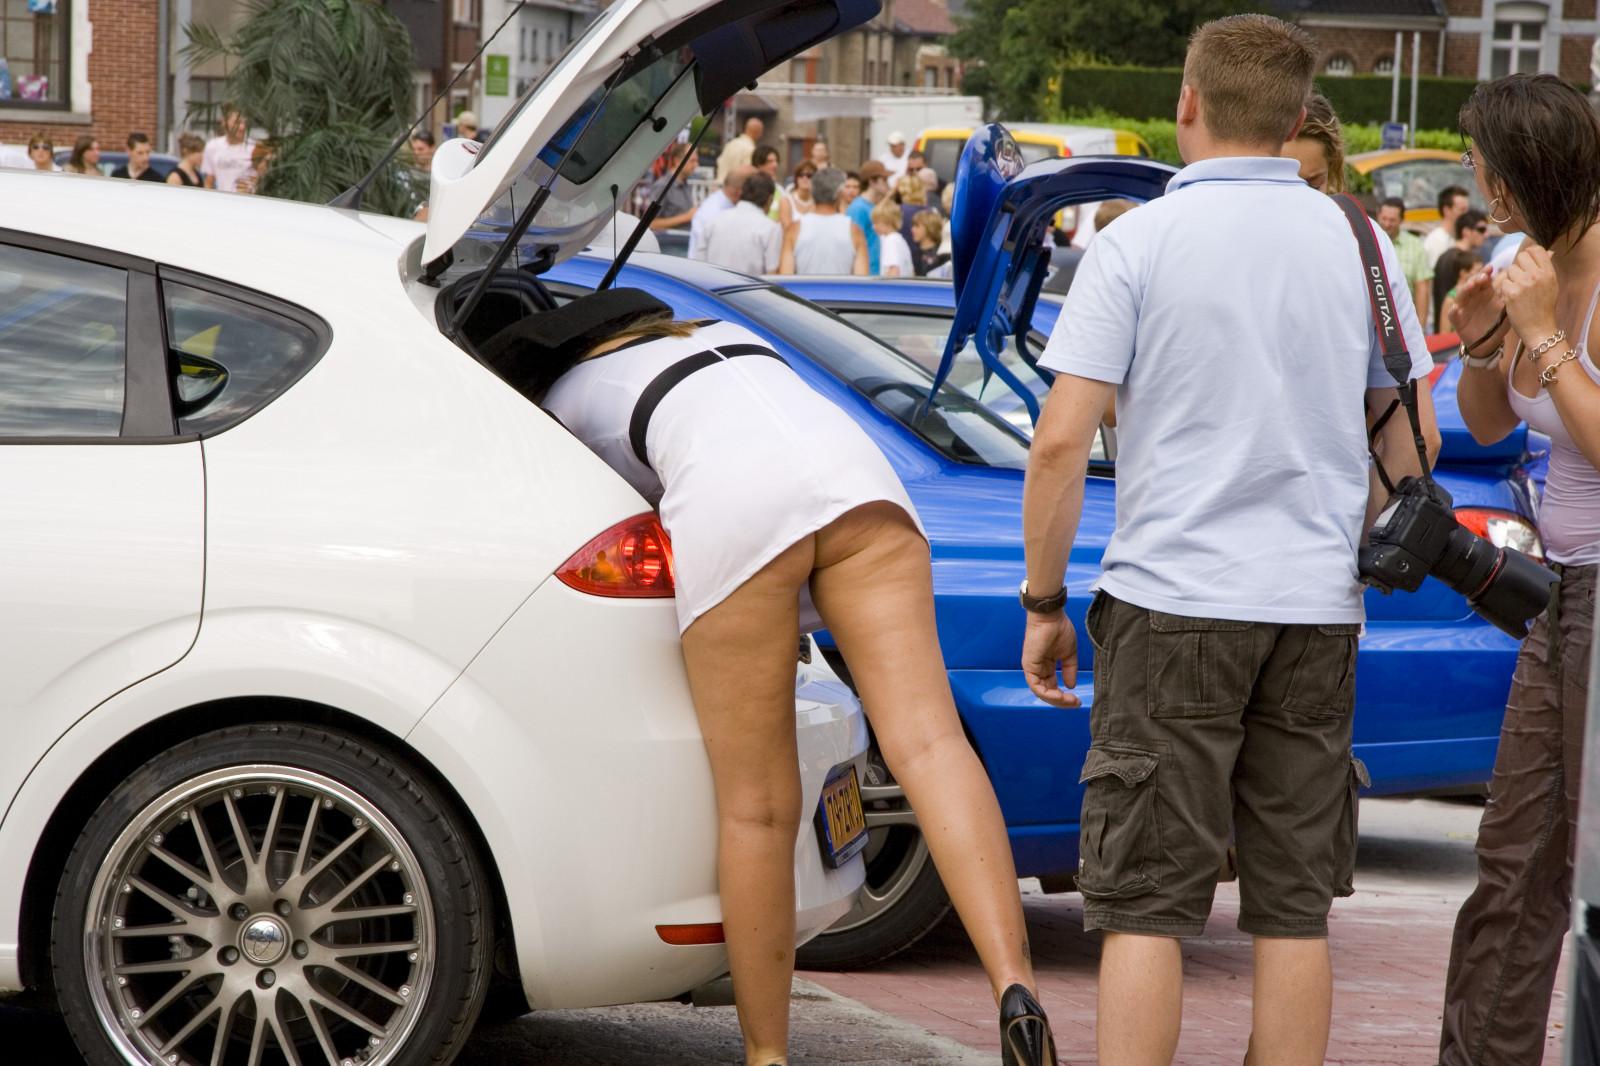 Girl In Punjabi Suit Wallpaper Wallpaper Model Car Ass Legs Tuning Upskirt Hostes